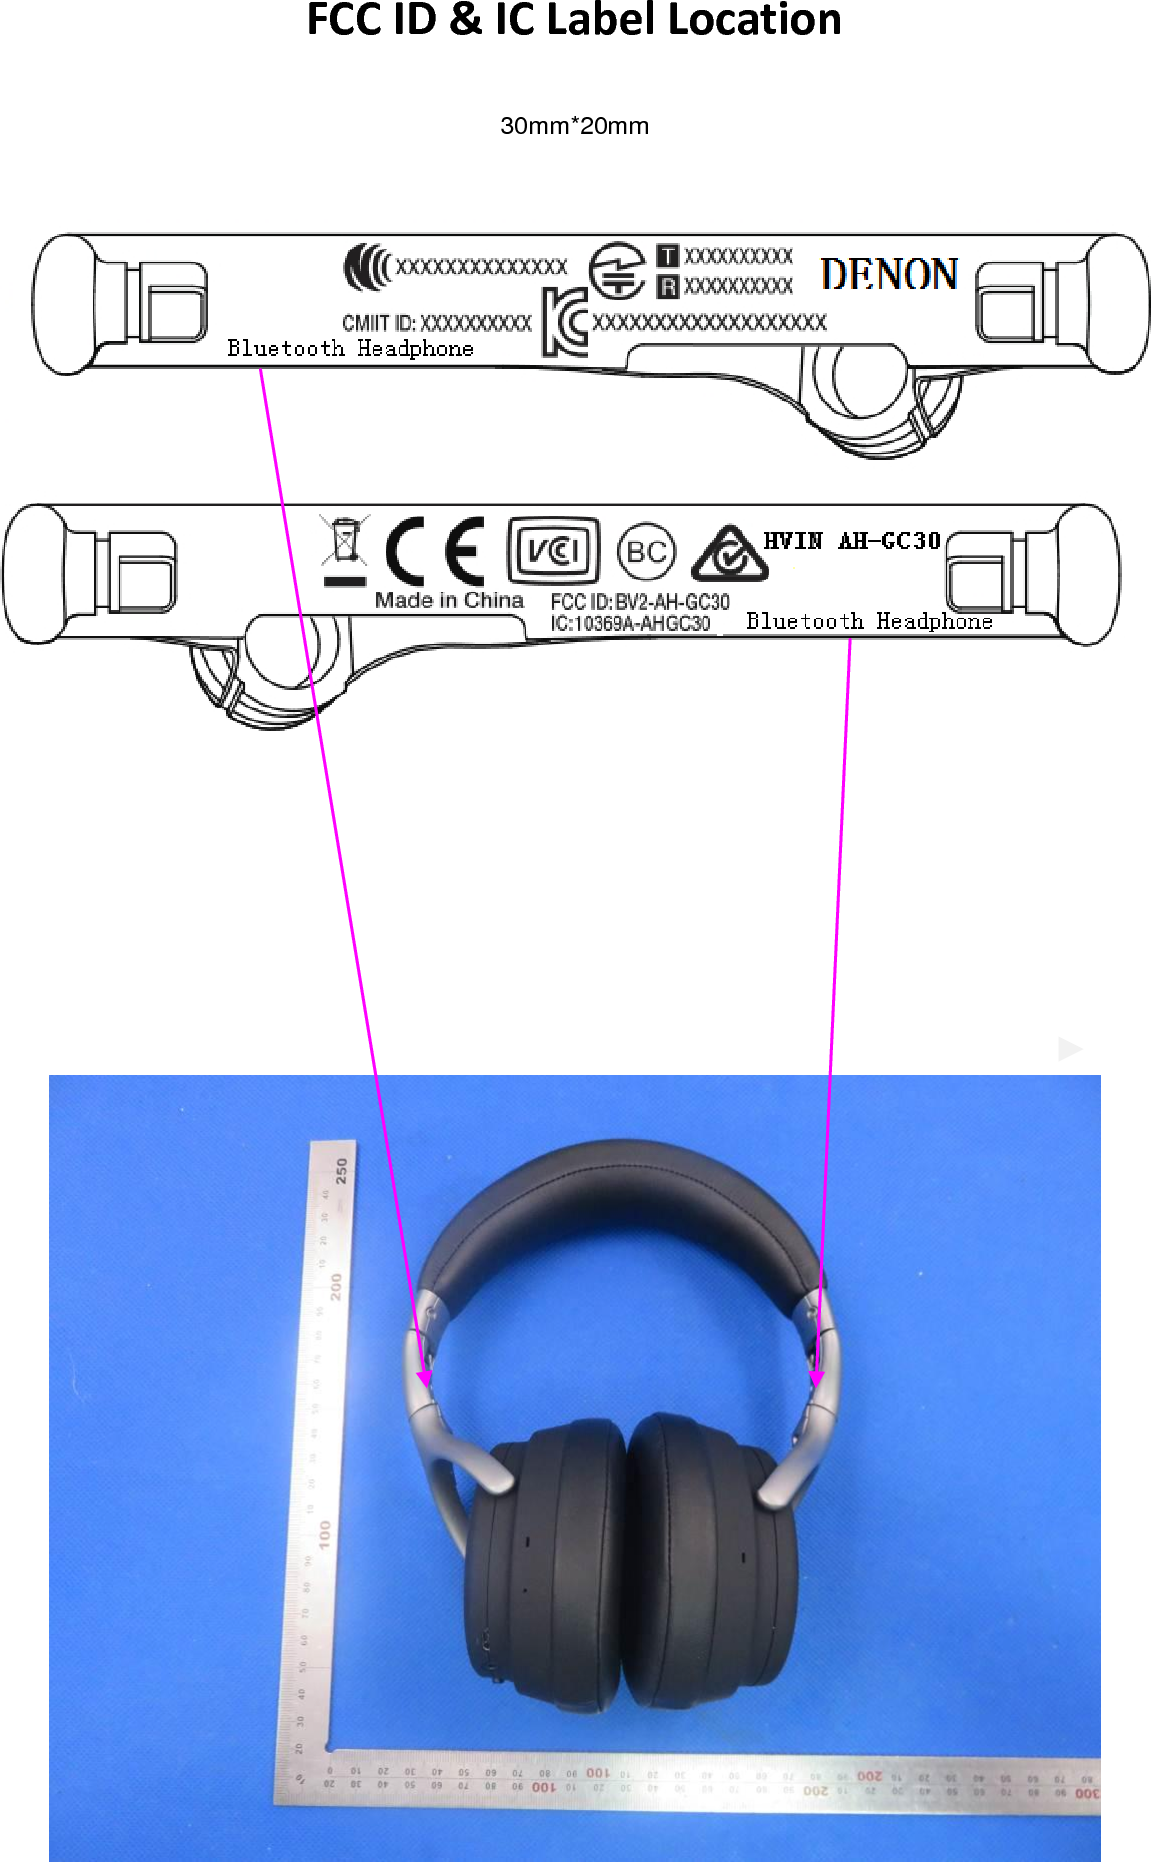 D and M, Holdings Inc  Bluetooth Headphone AH-GC30 (BV2-AH